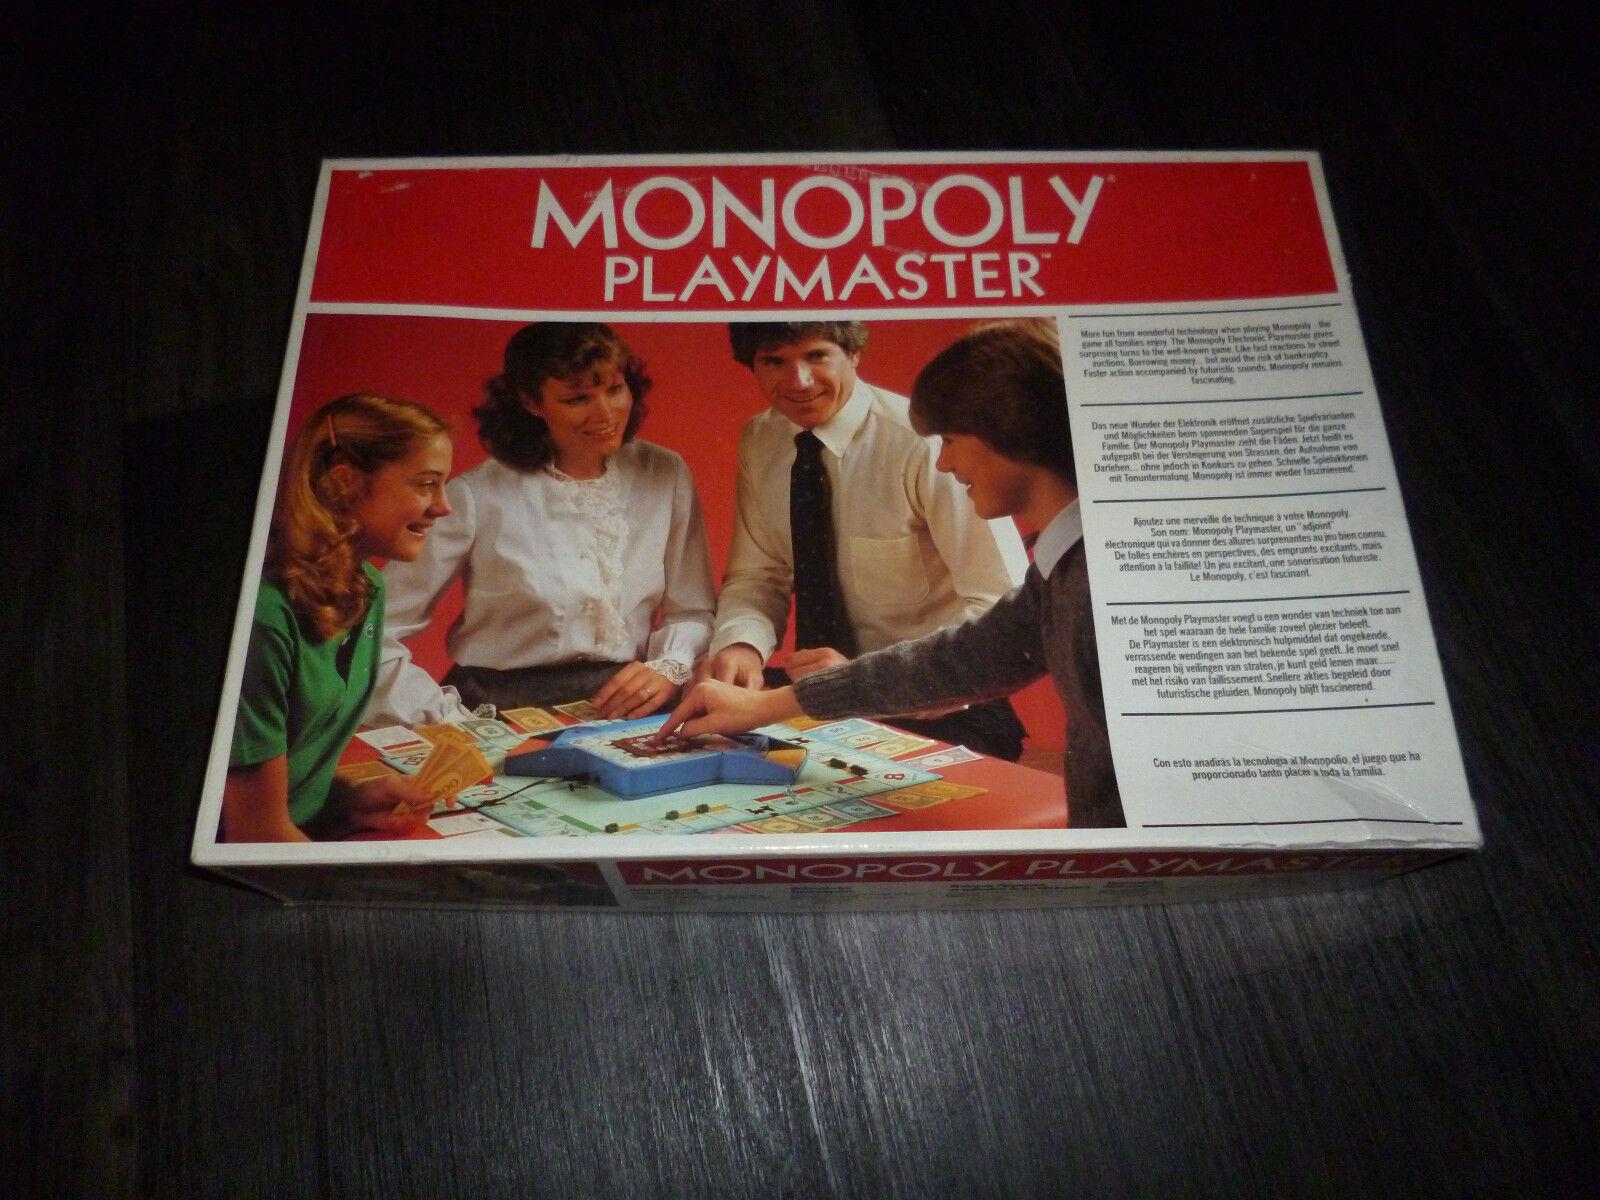 Monopoly Playmaster Playmaster Playmaster das erste Elektrische Monopolyspiel  RAR f0a55d